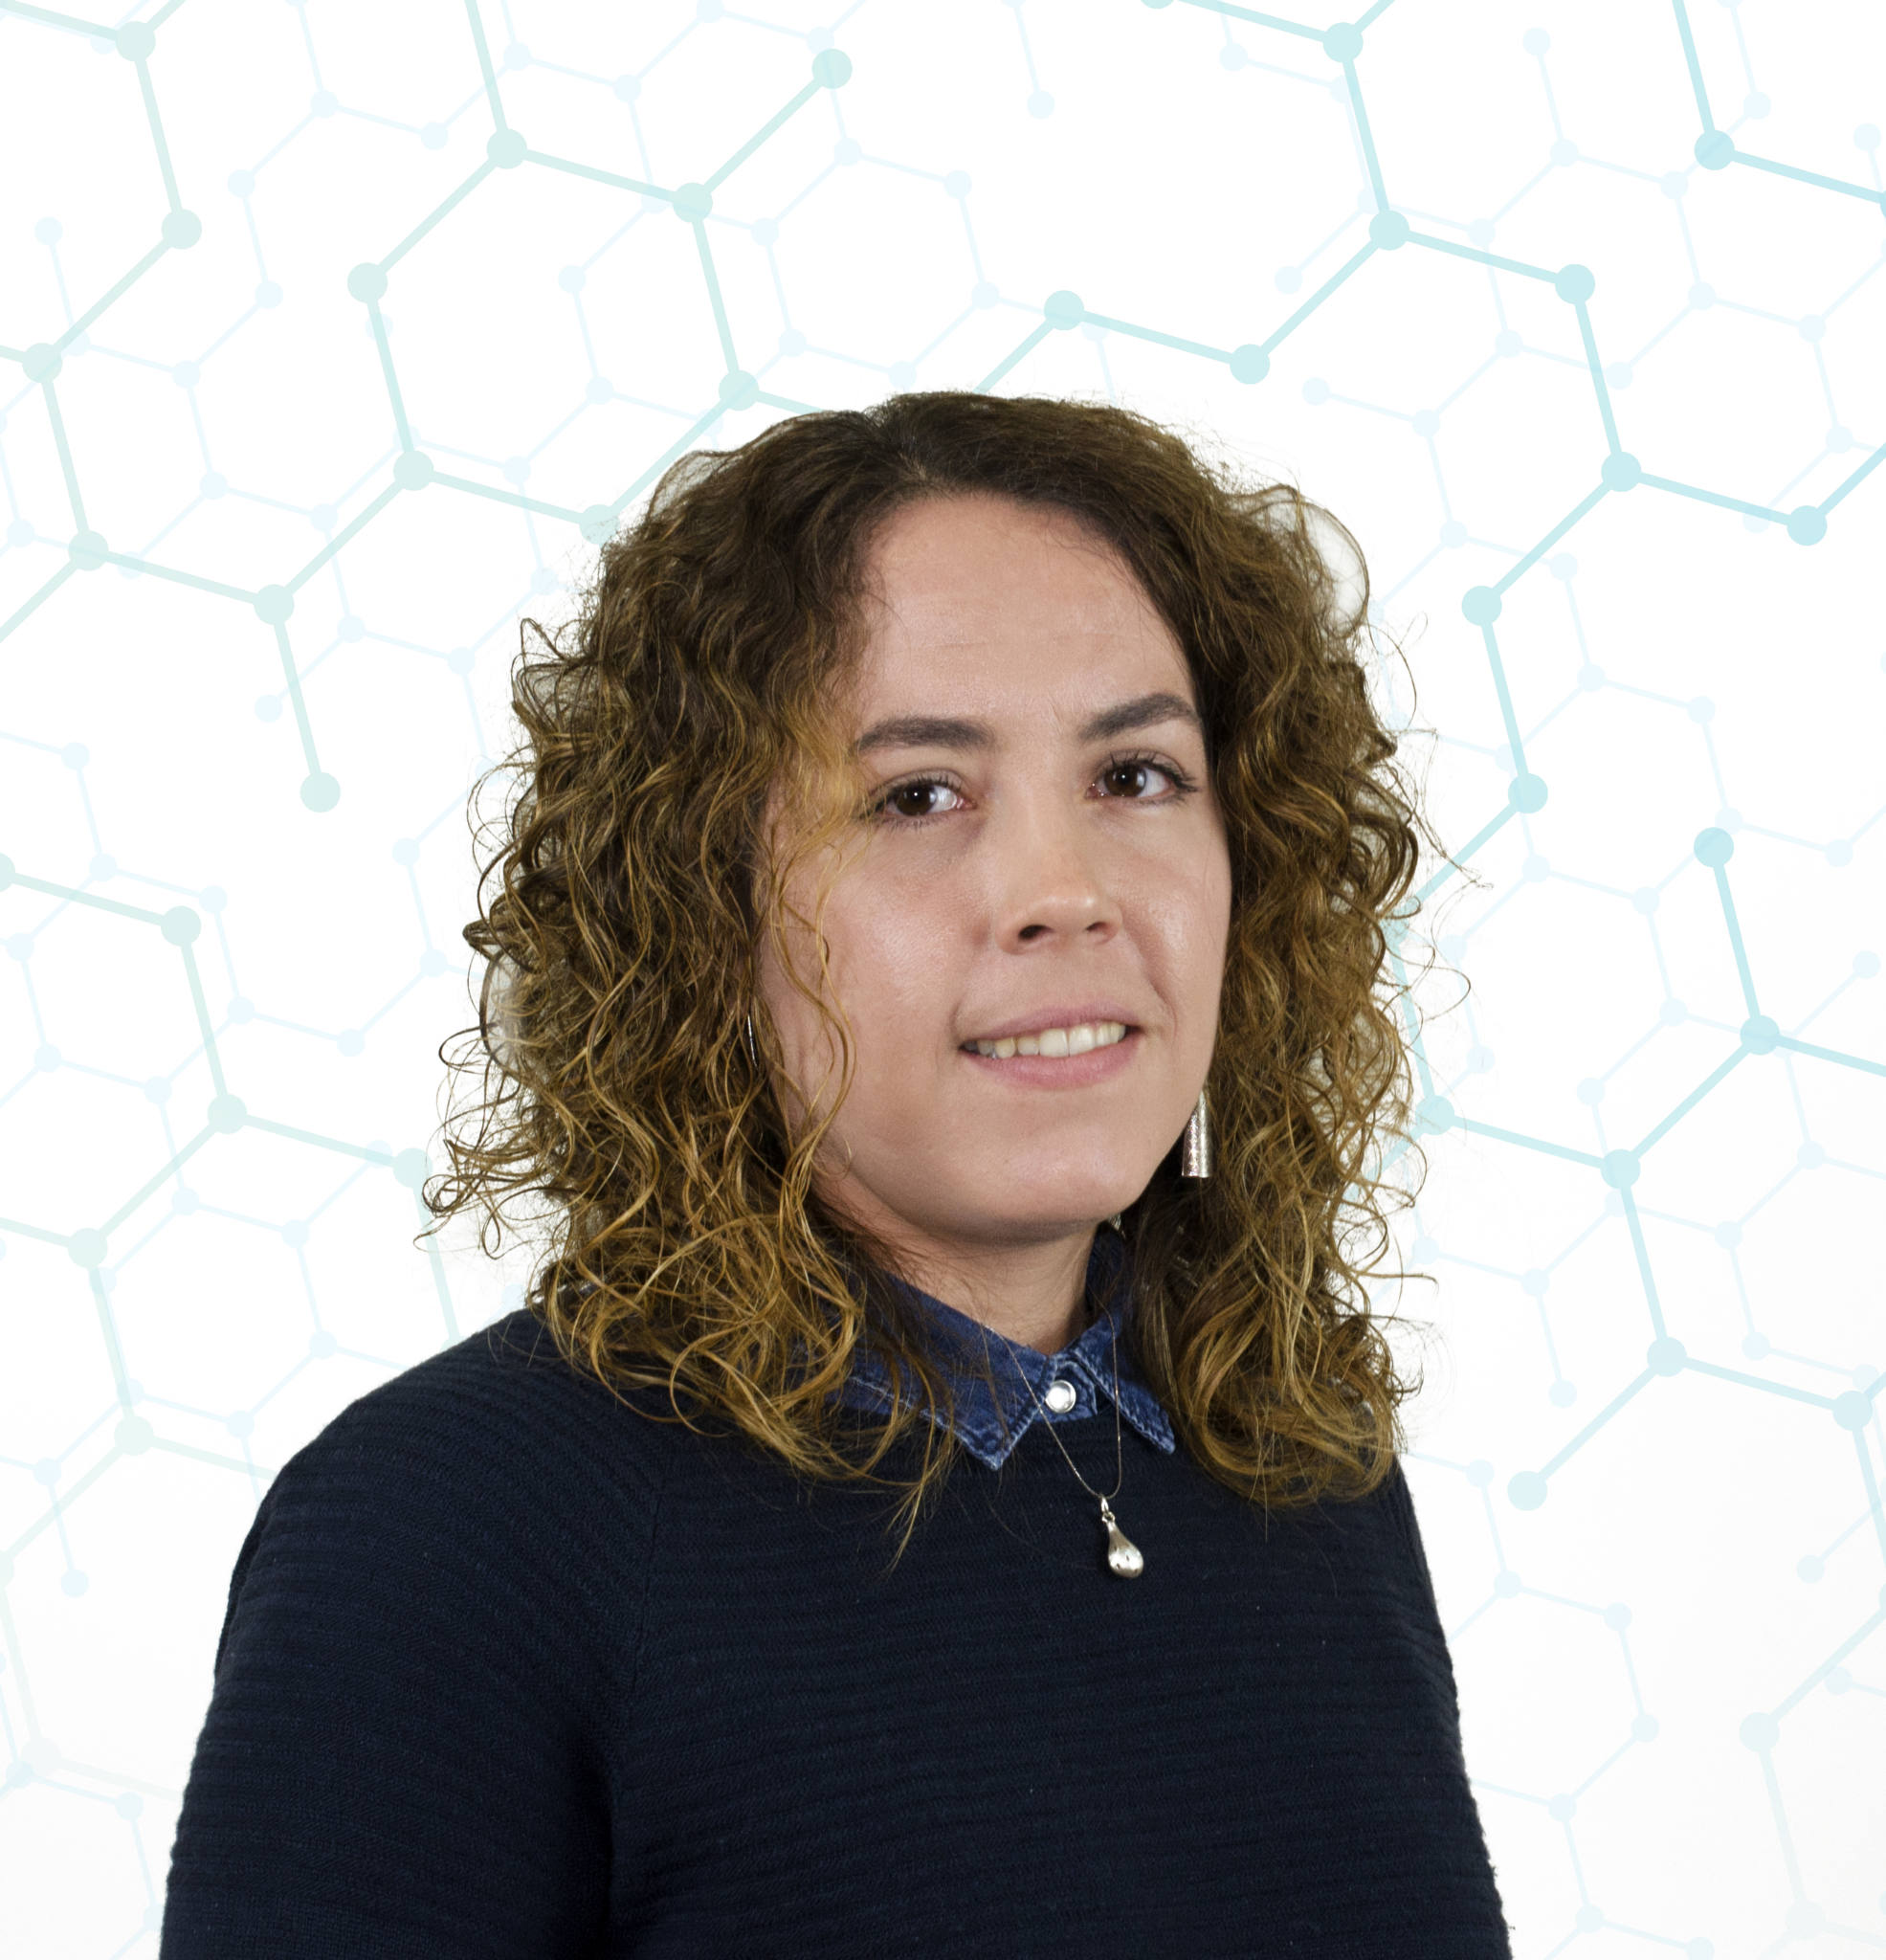 Marta Sainz